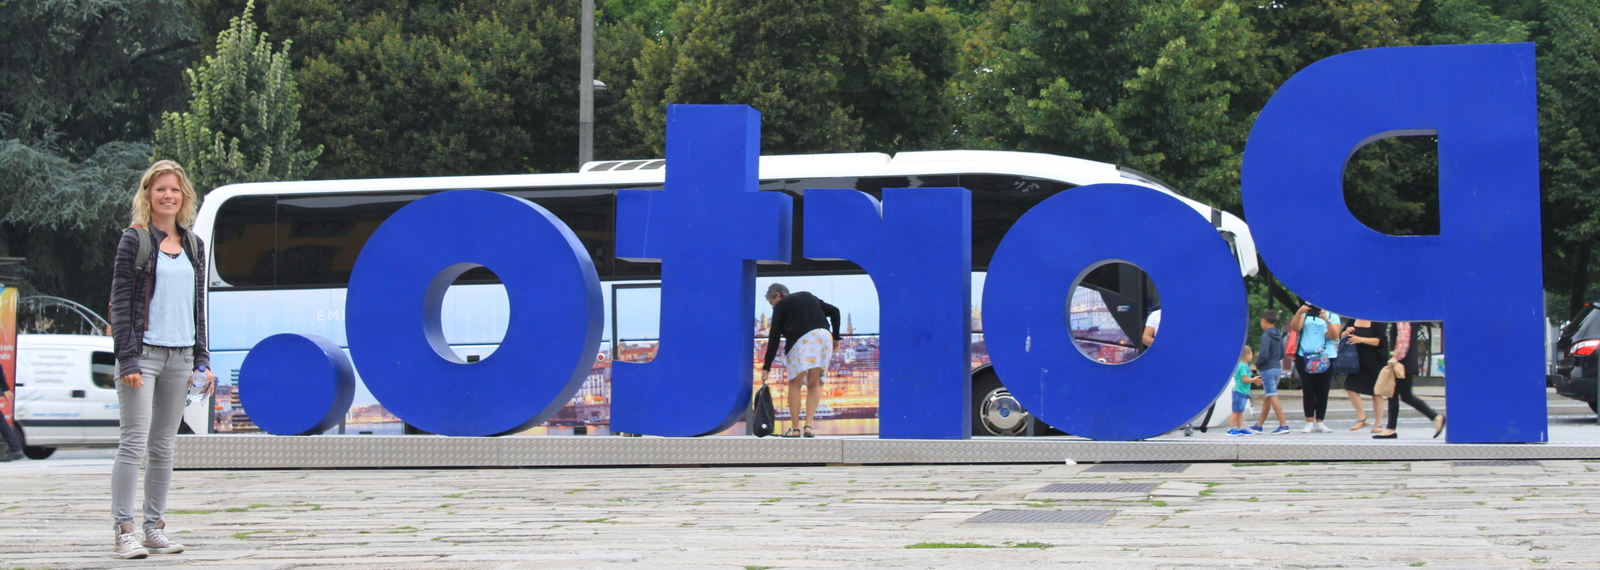 Porto, city sign